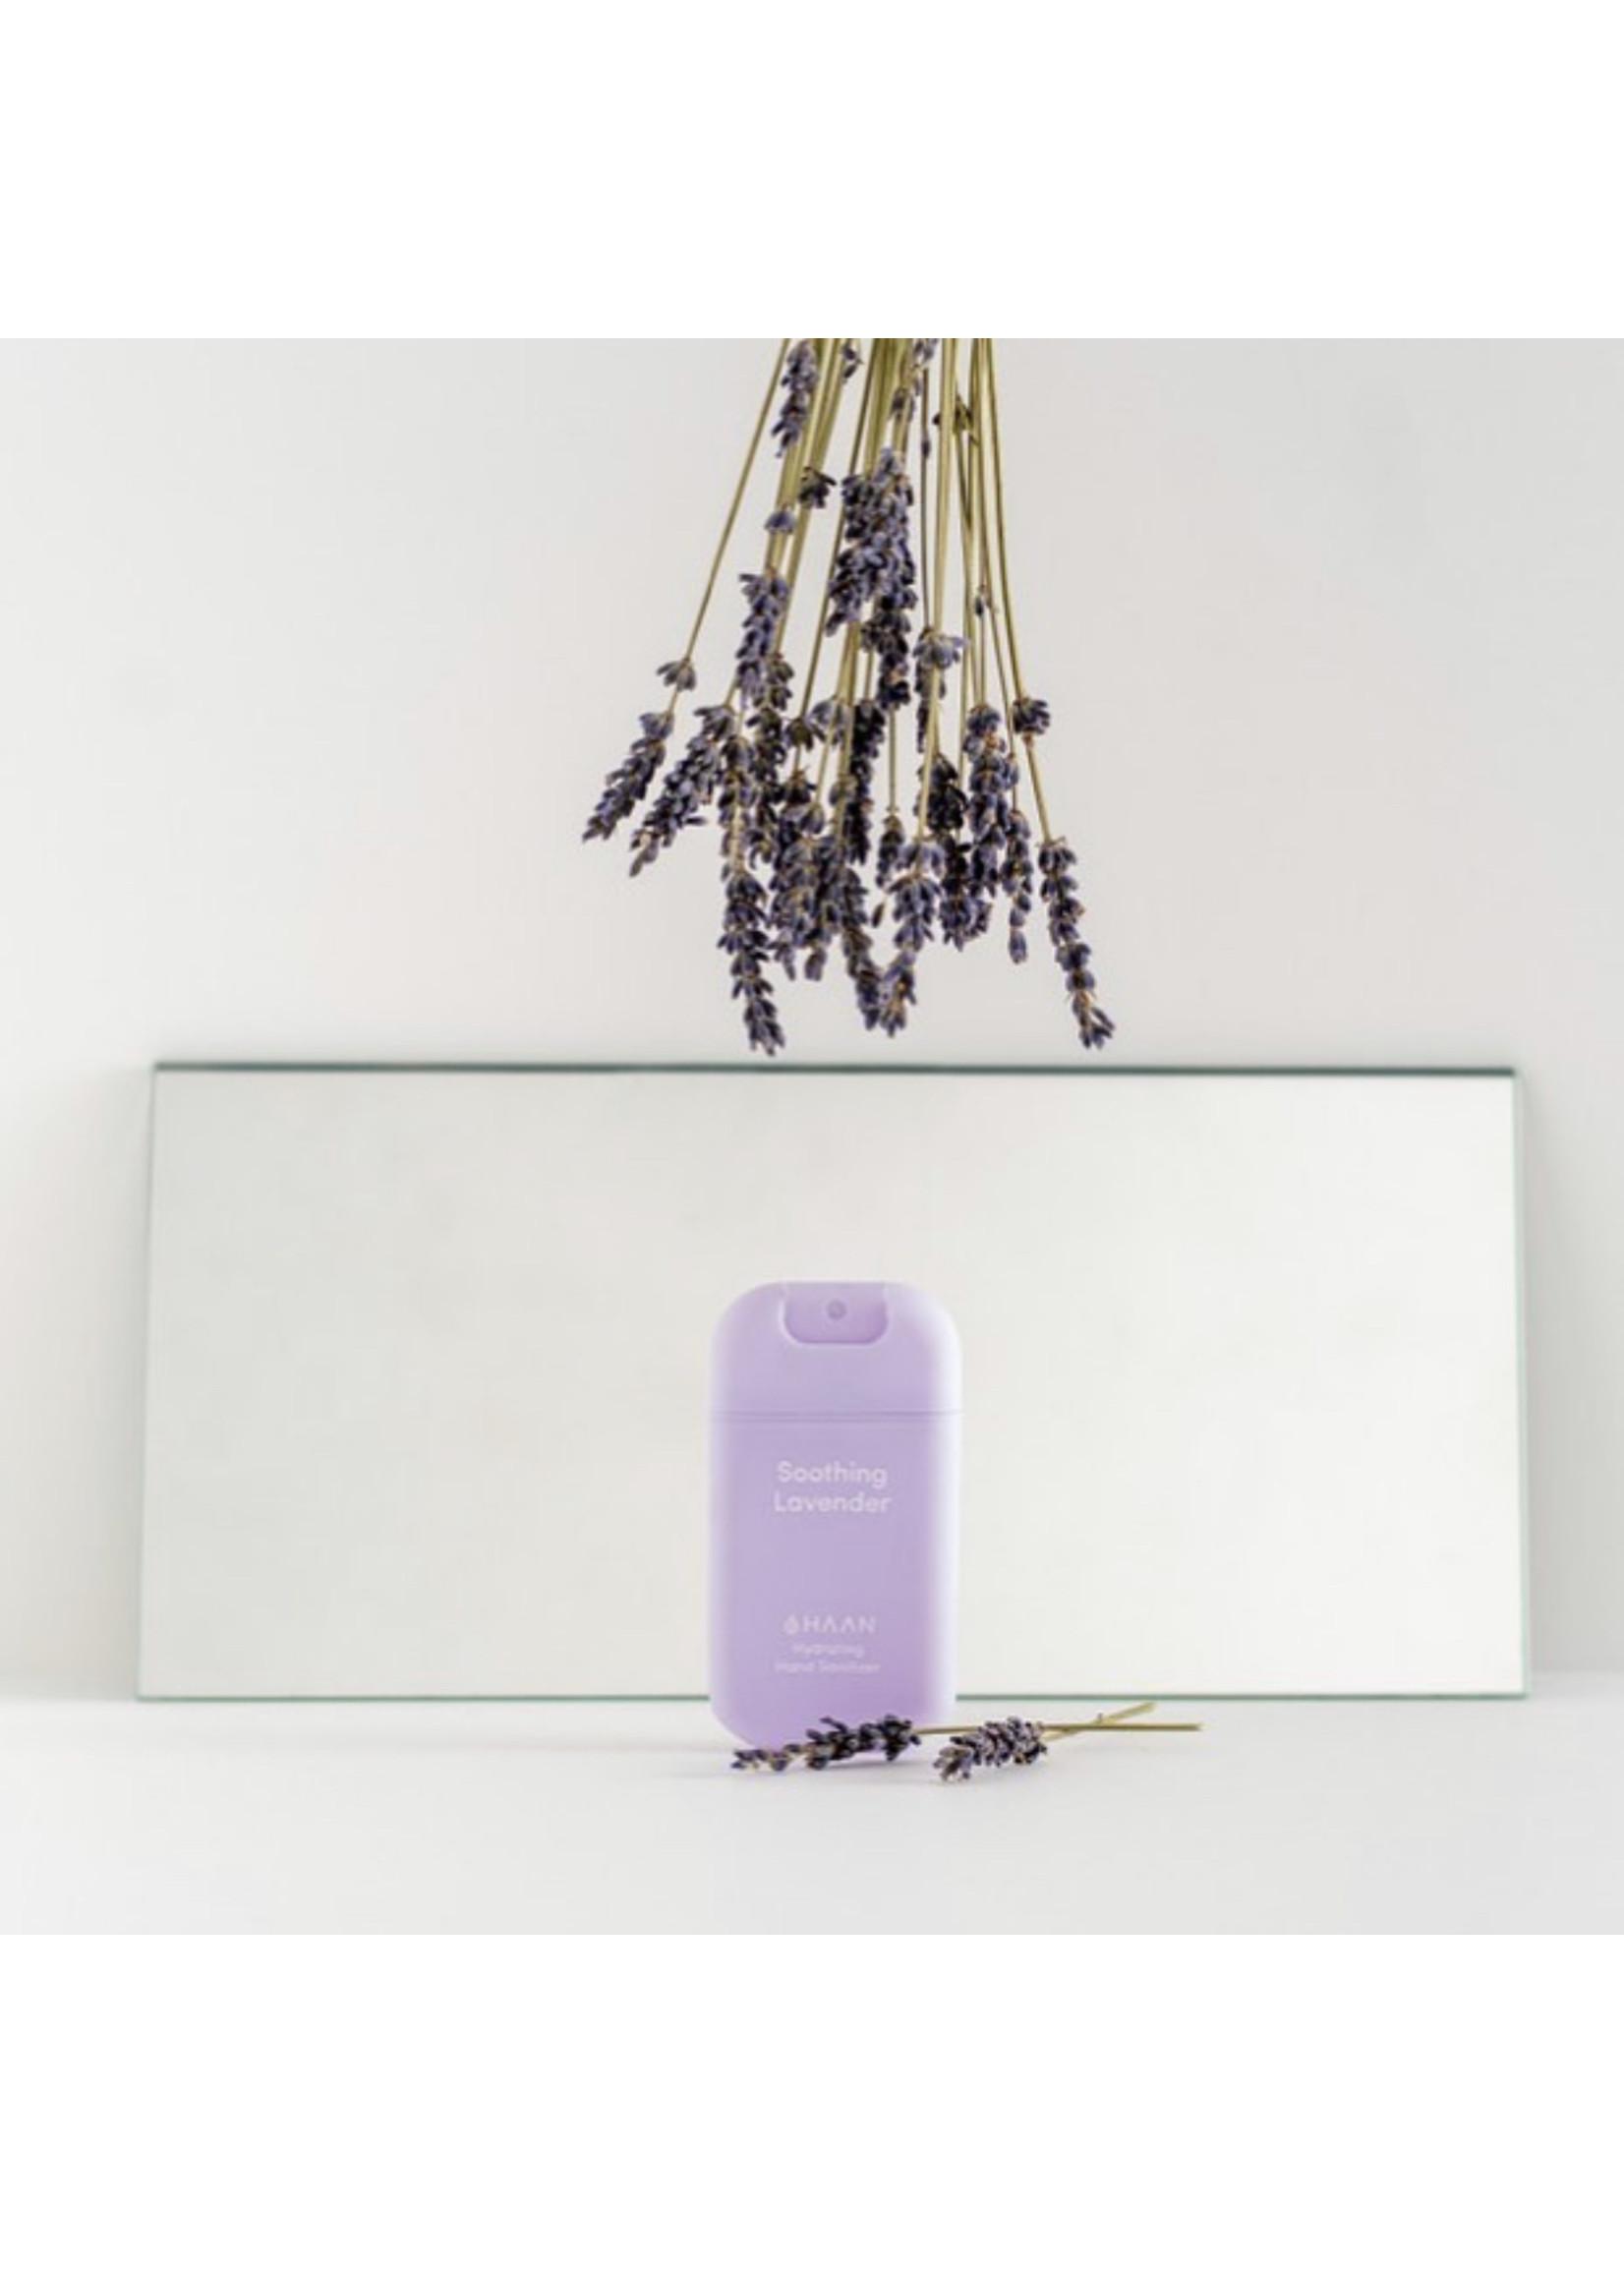 HAND SANITIZER Soothing Lavender